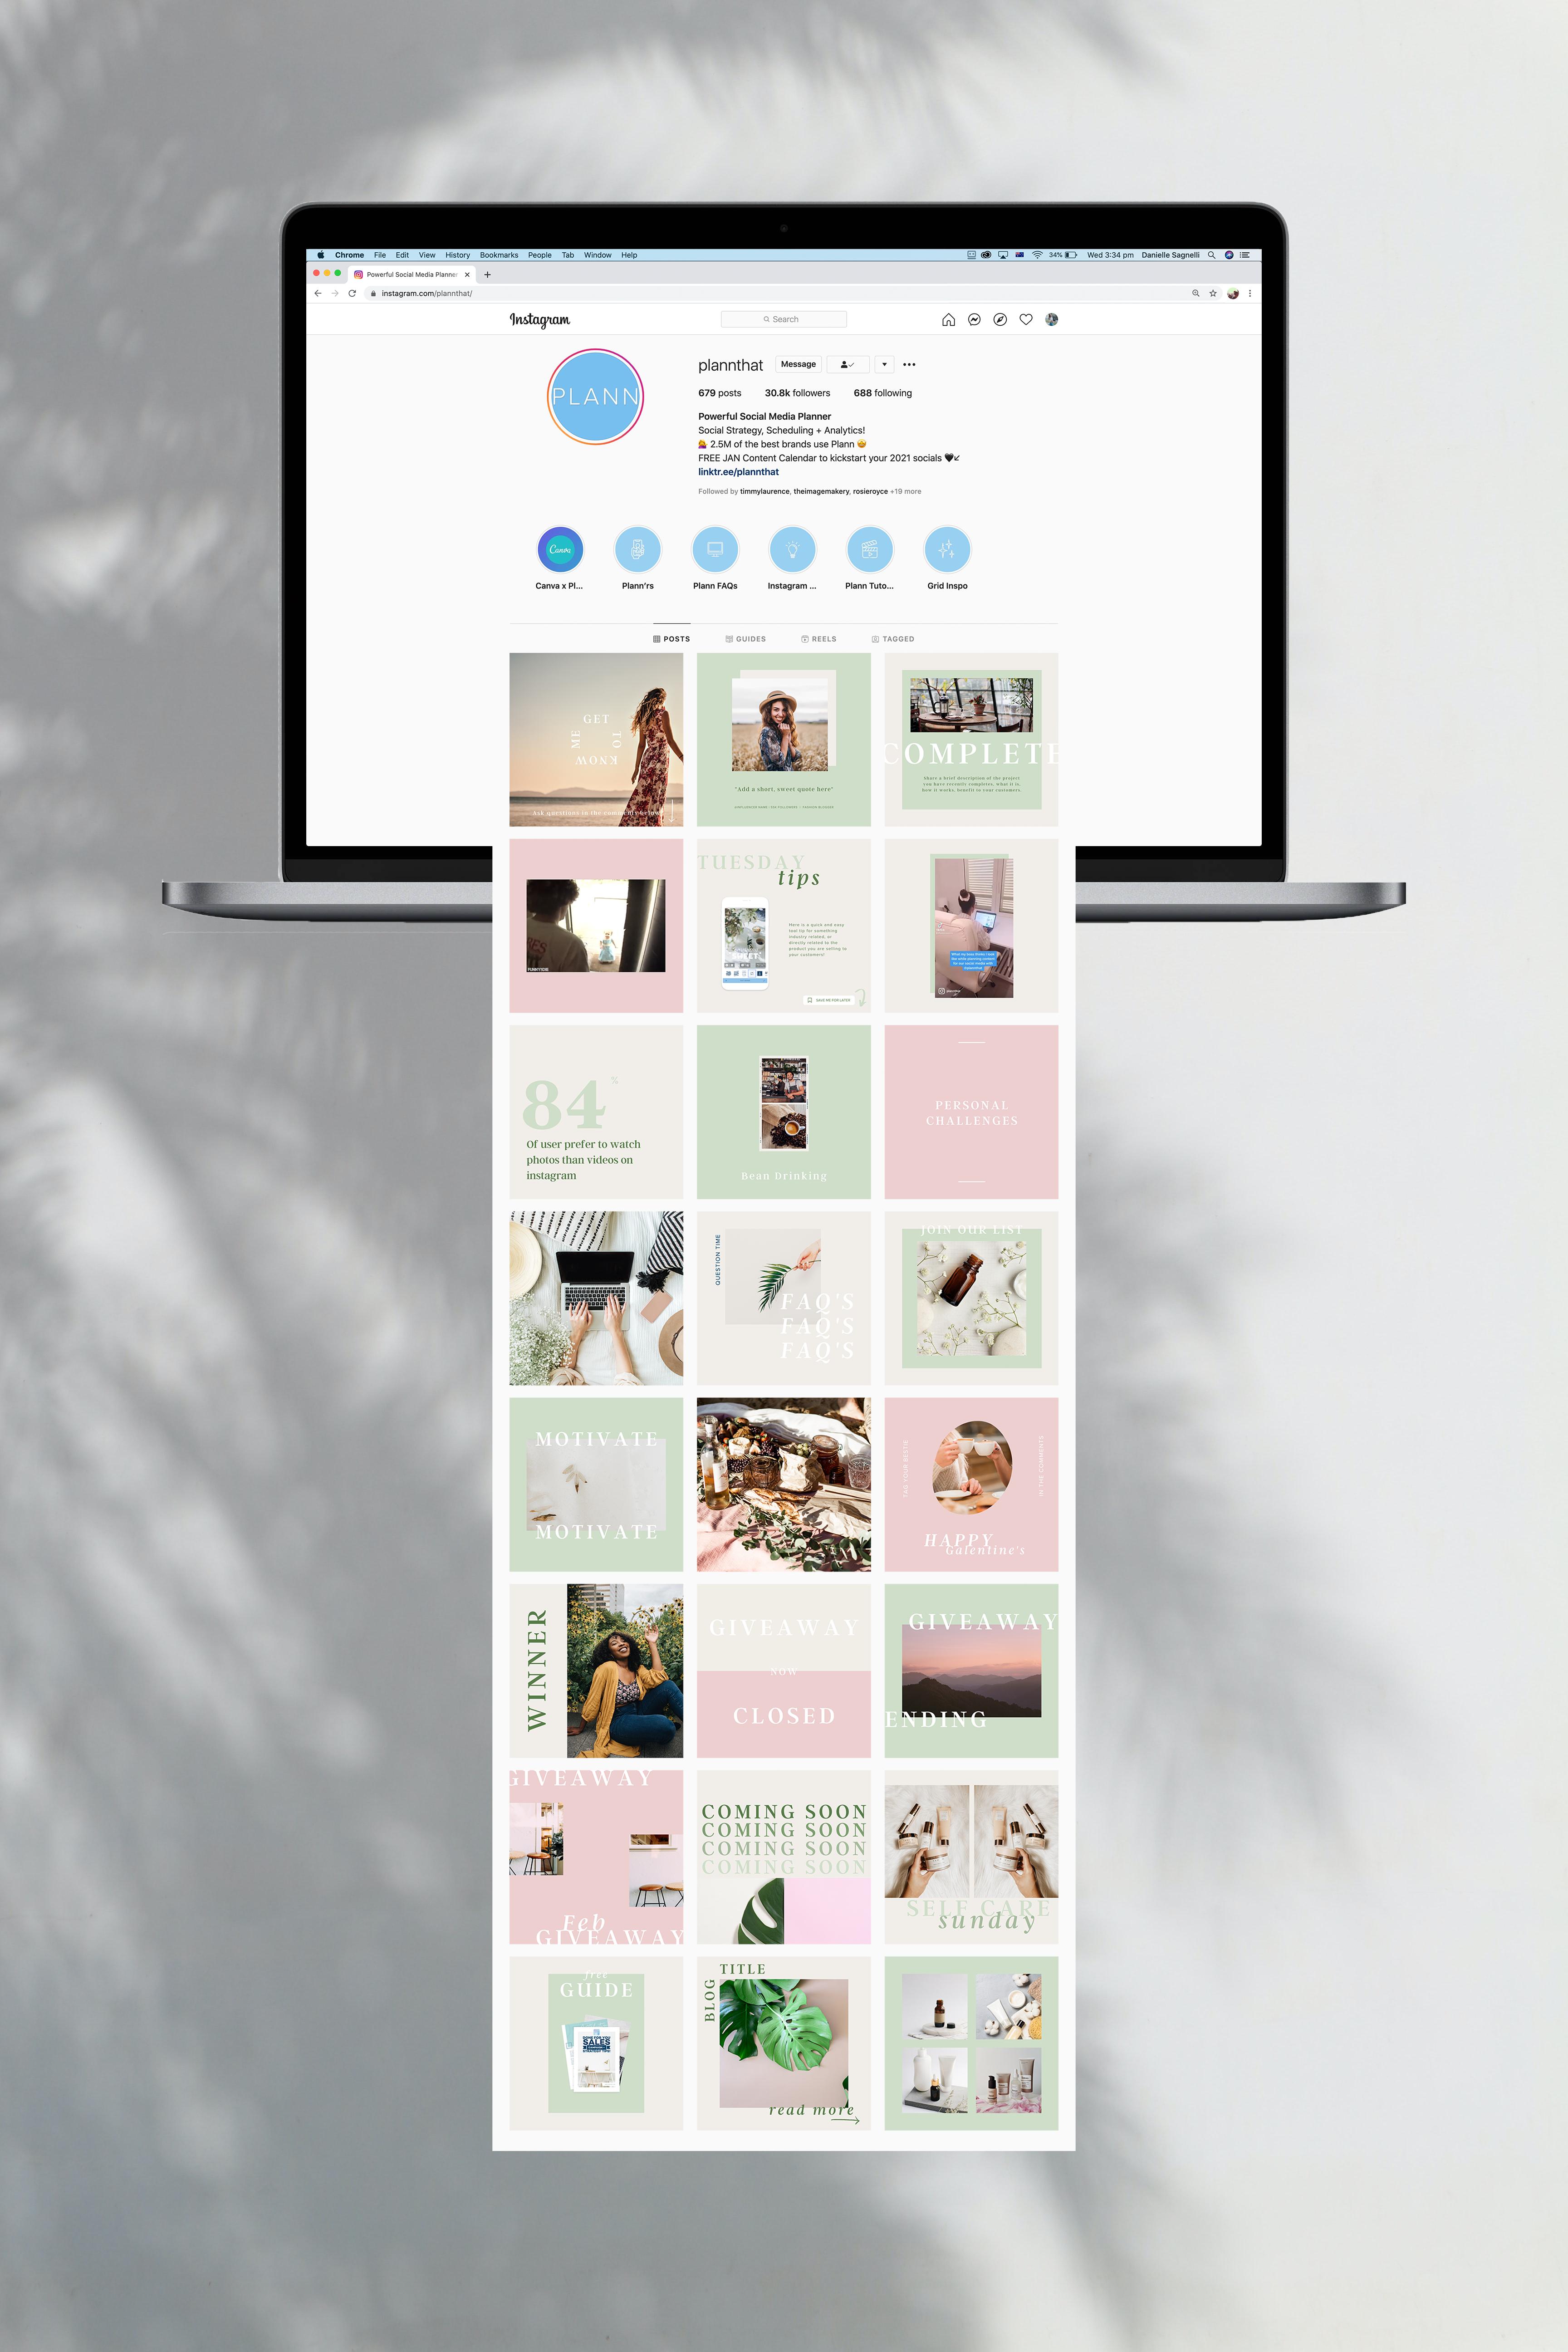 NEW! Interactive February Content Calendar